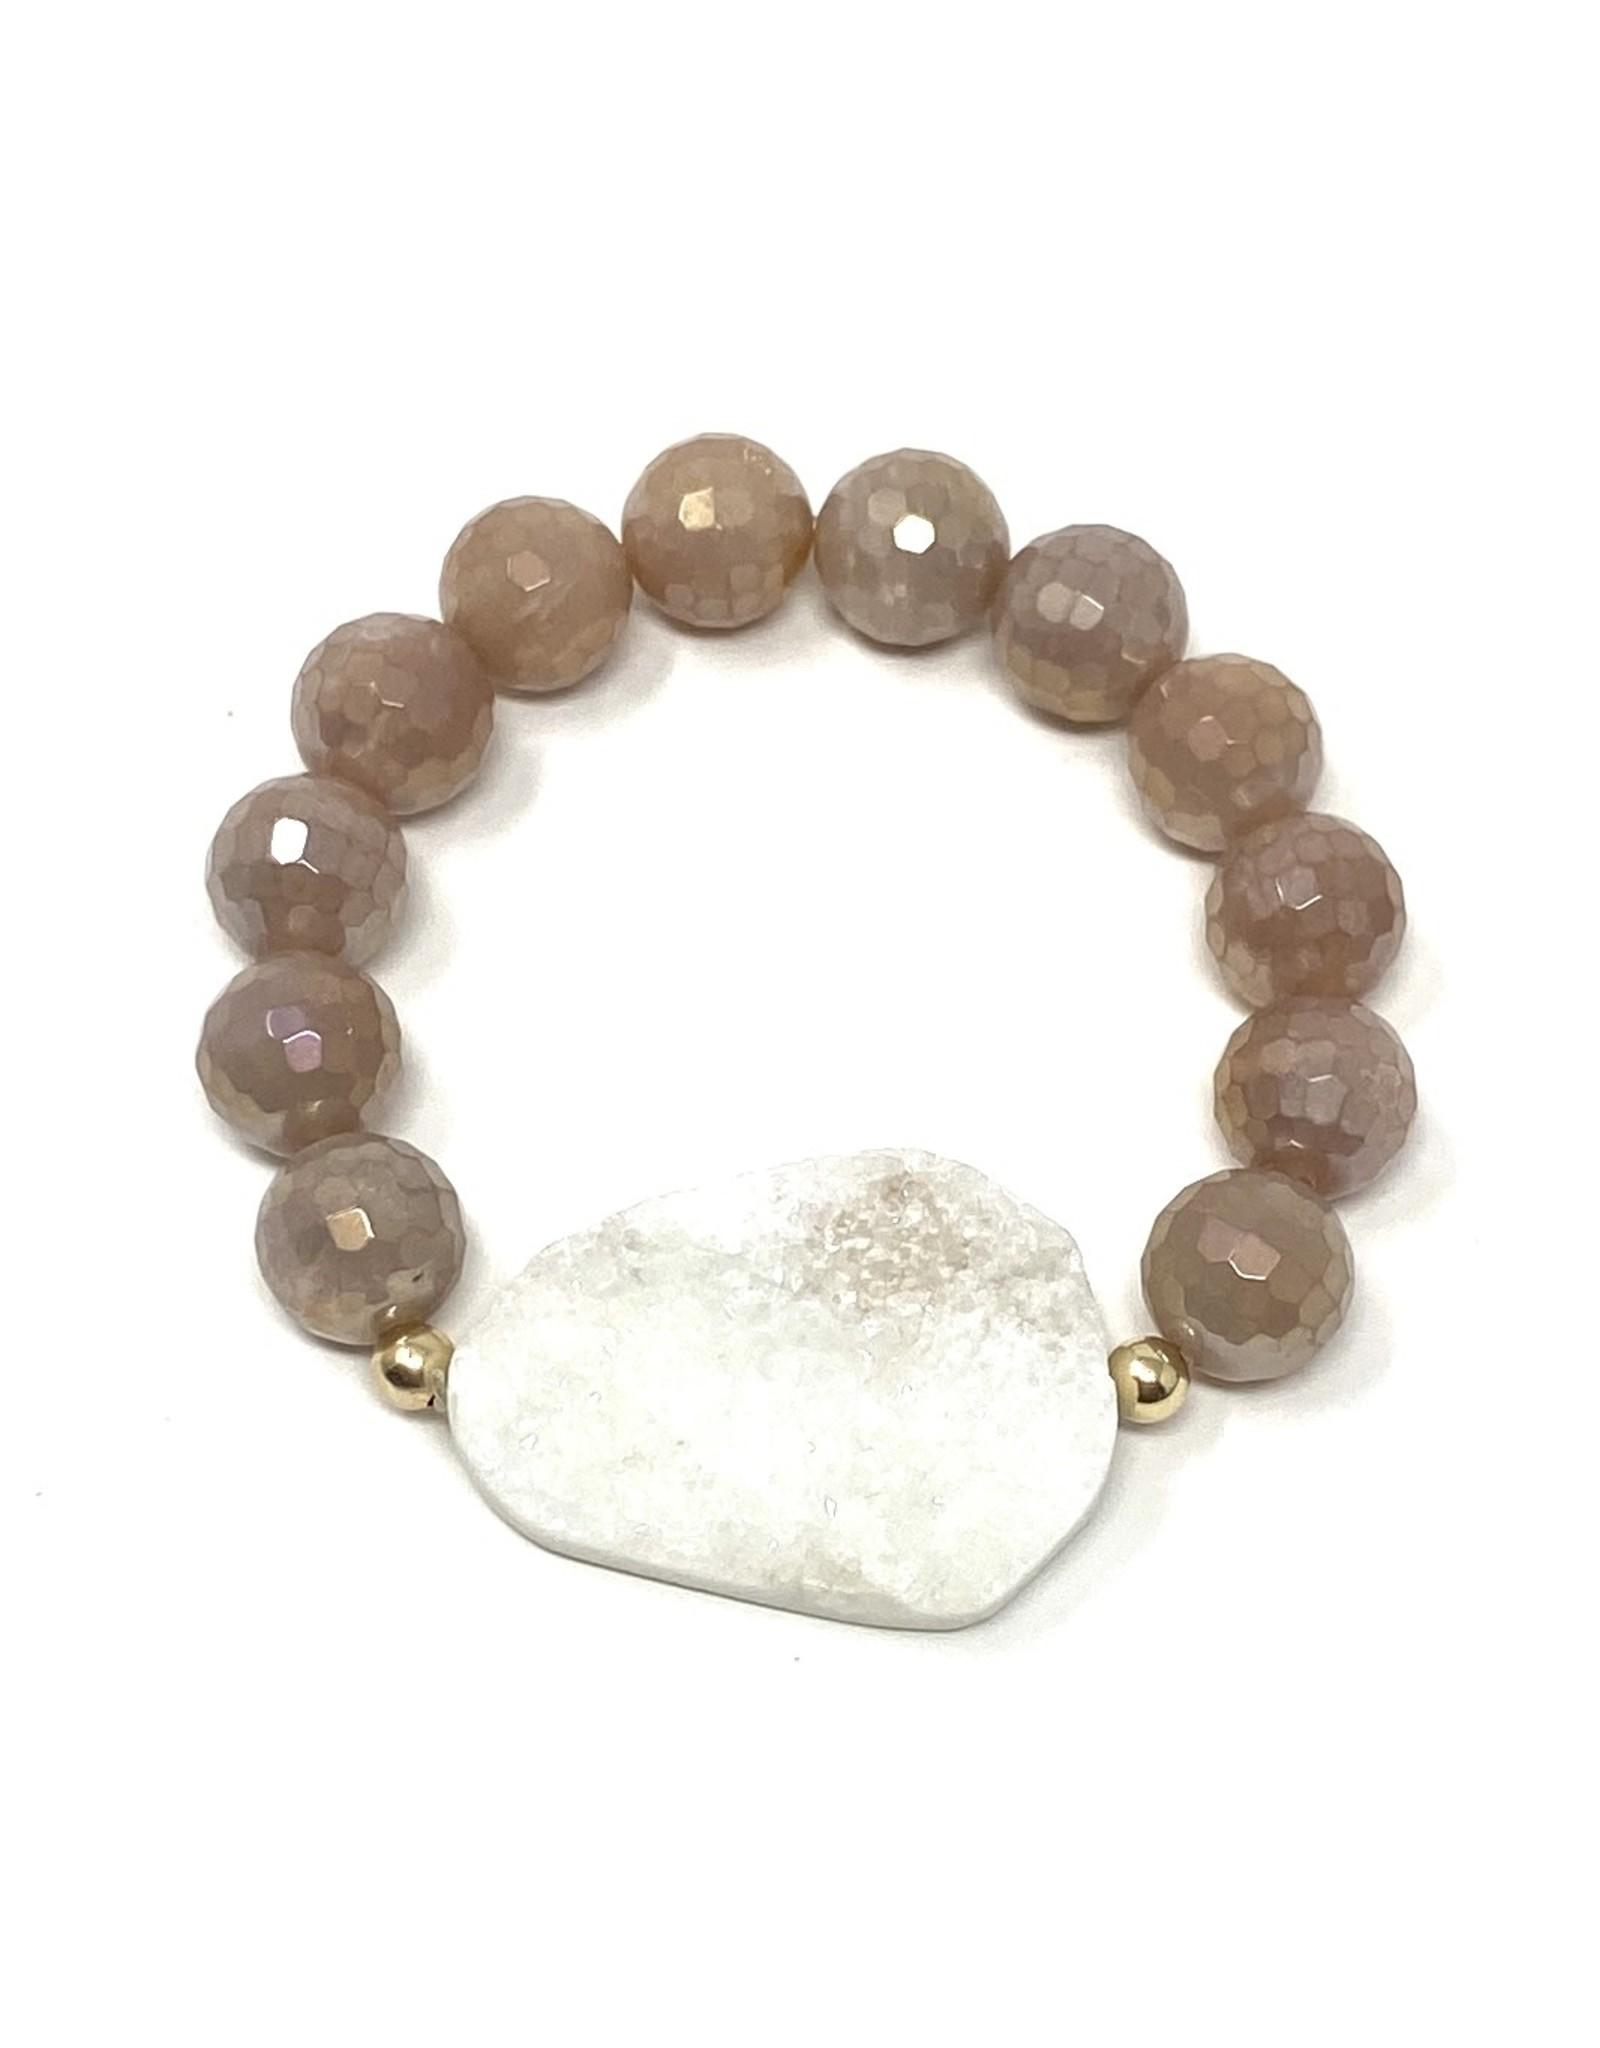 Sunstone & White Druzy Agate Bracelet